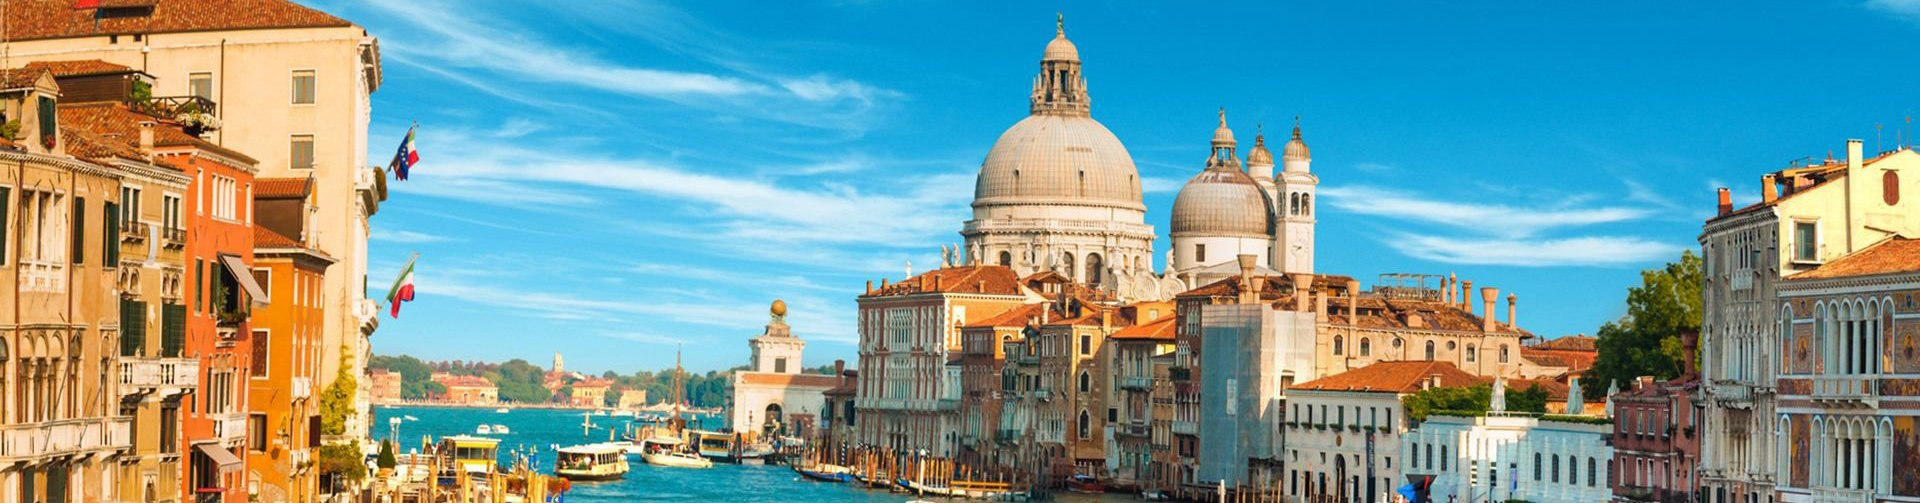 Italie, Venetië